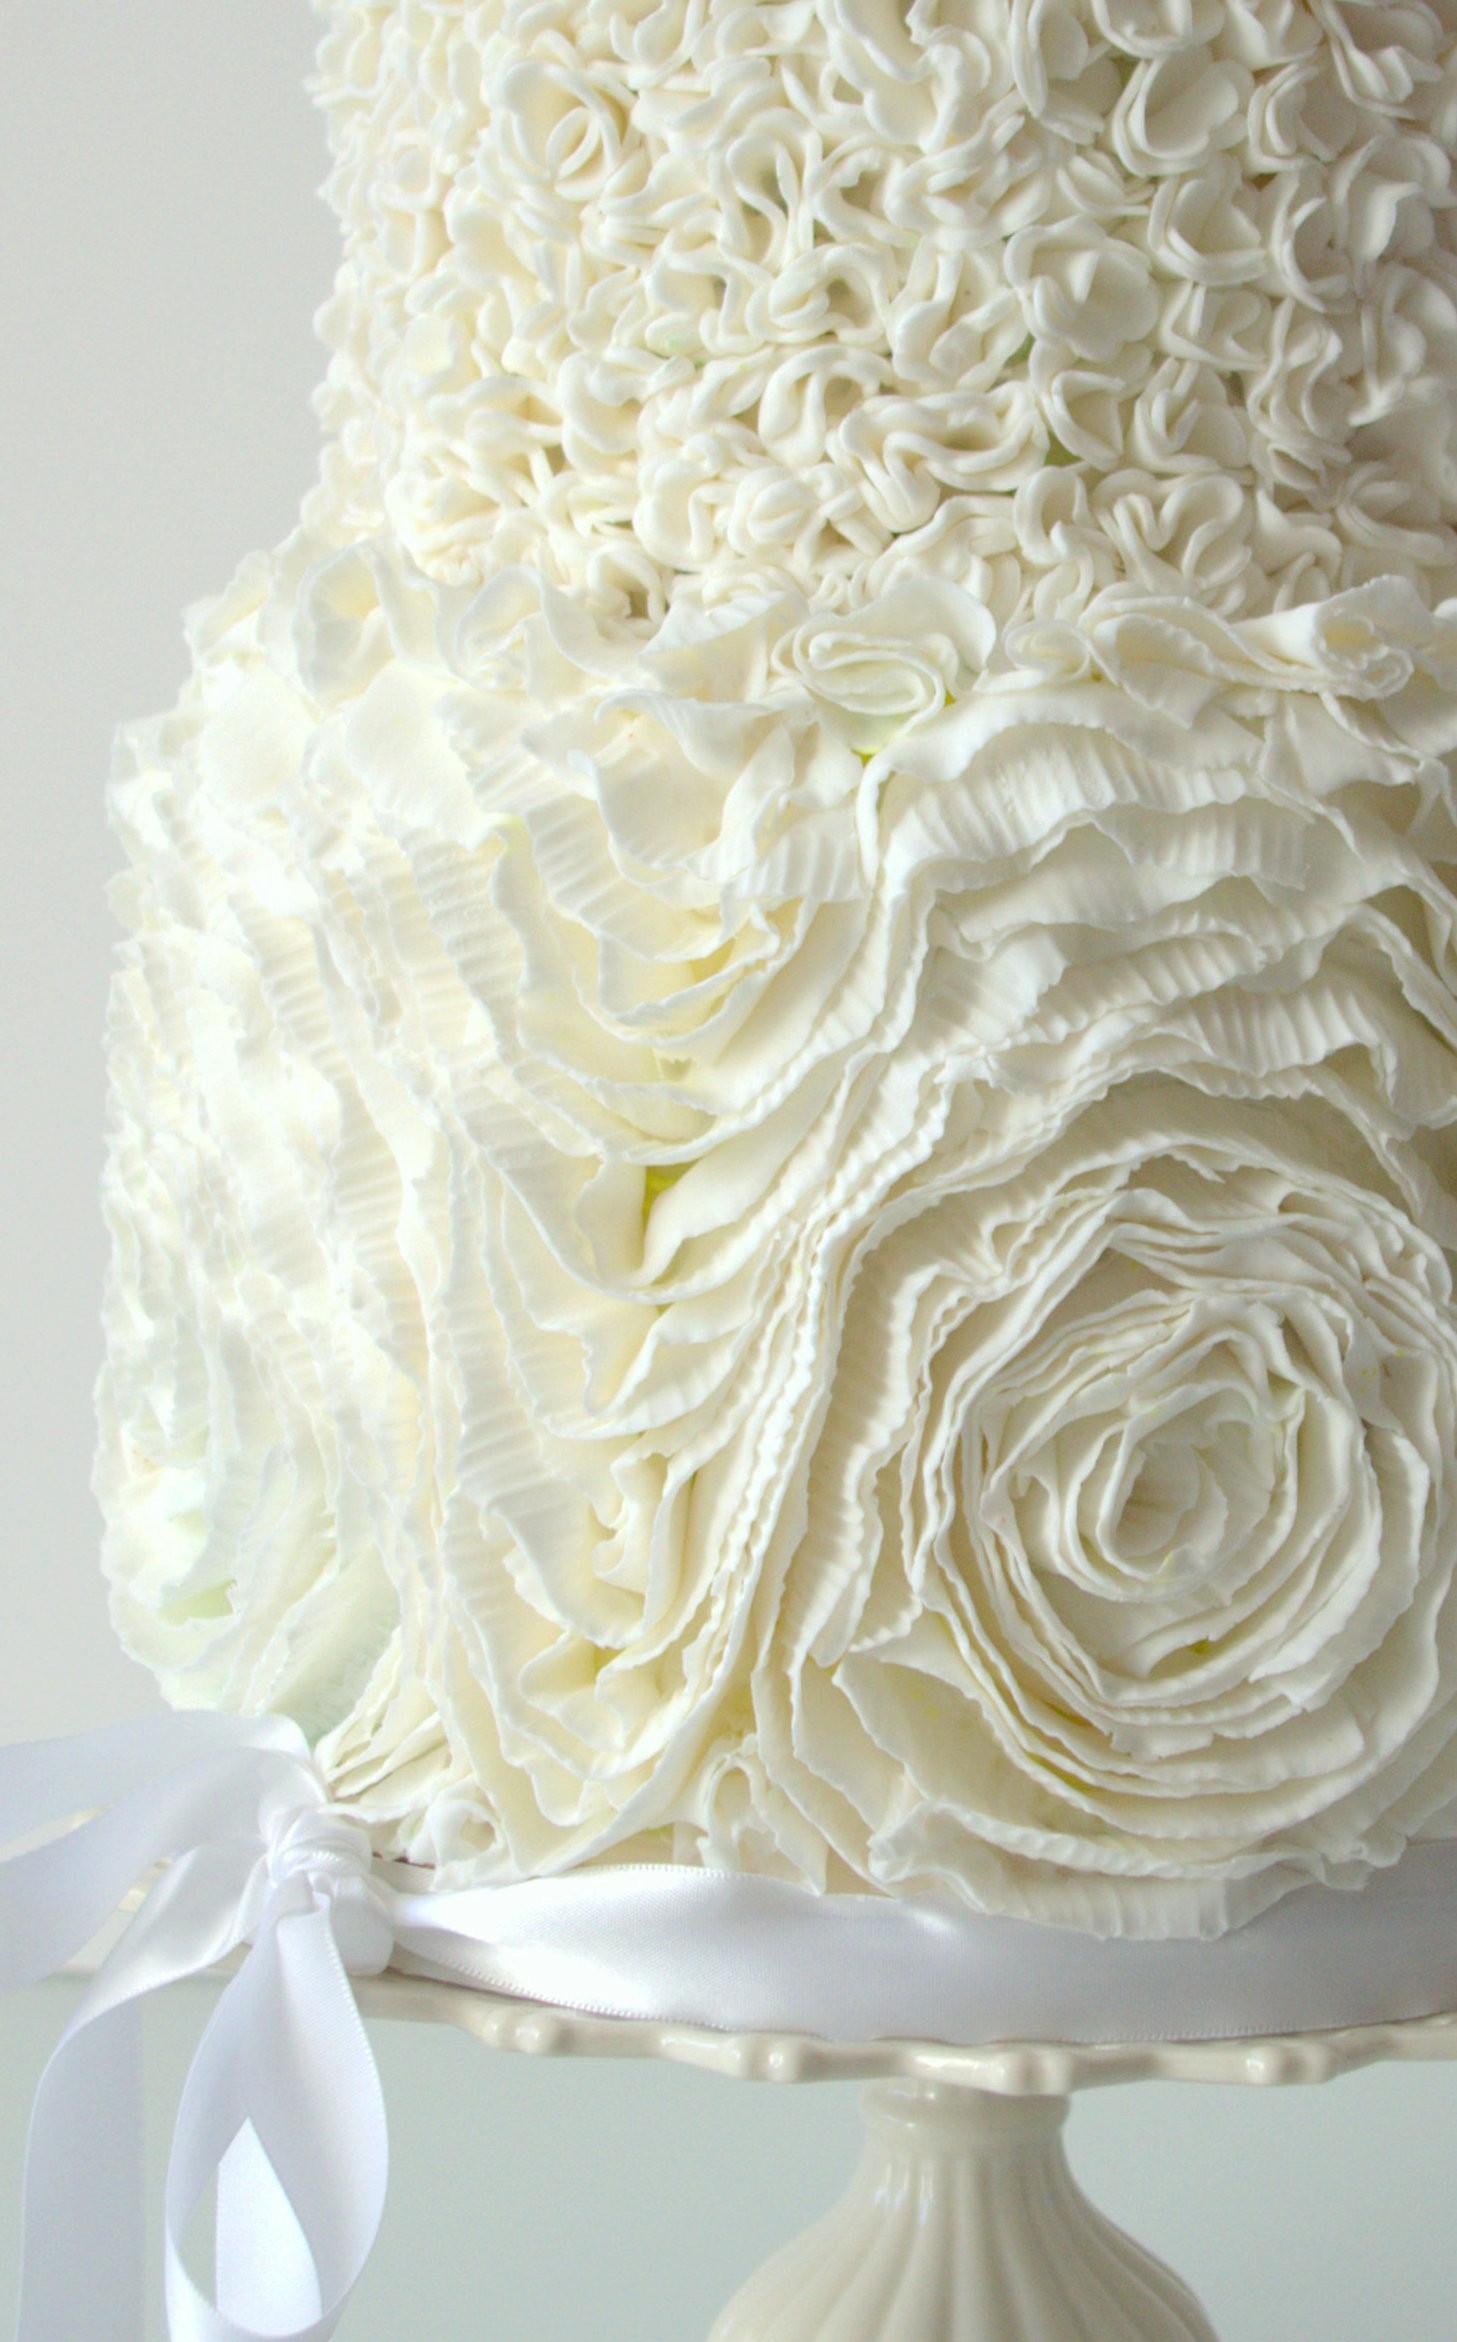 Ruffle Wedding Cakes  Ruffle Rose And Pompom Wedding Cake CakeCentral